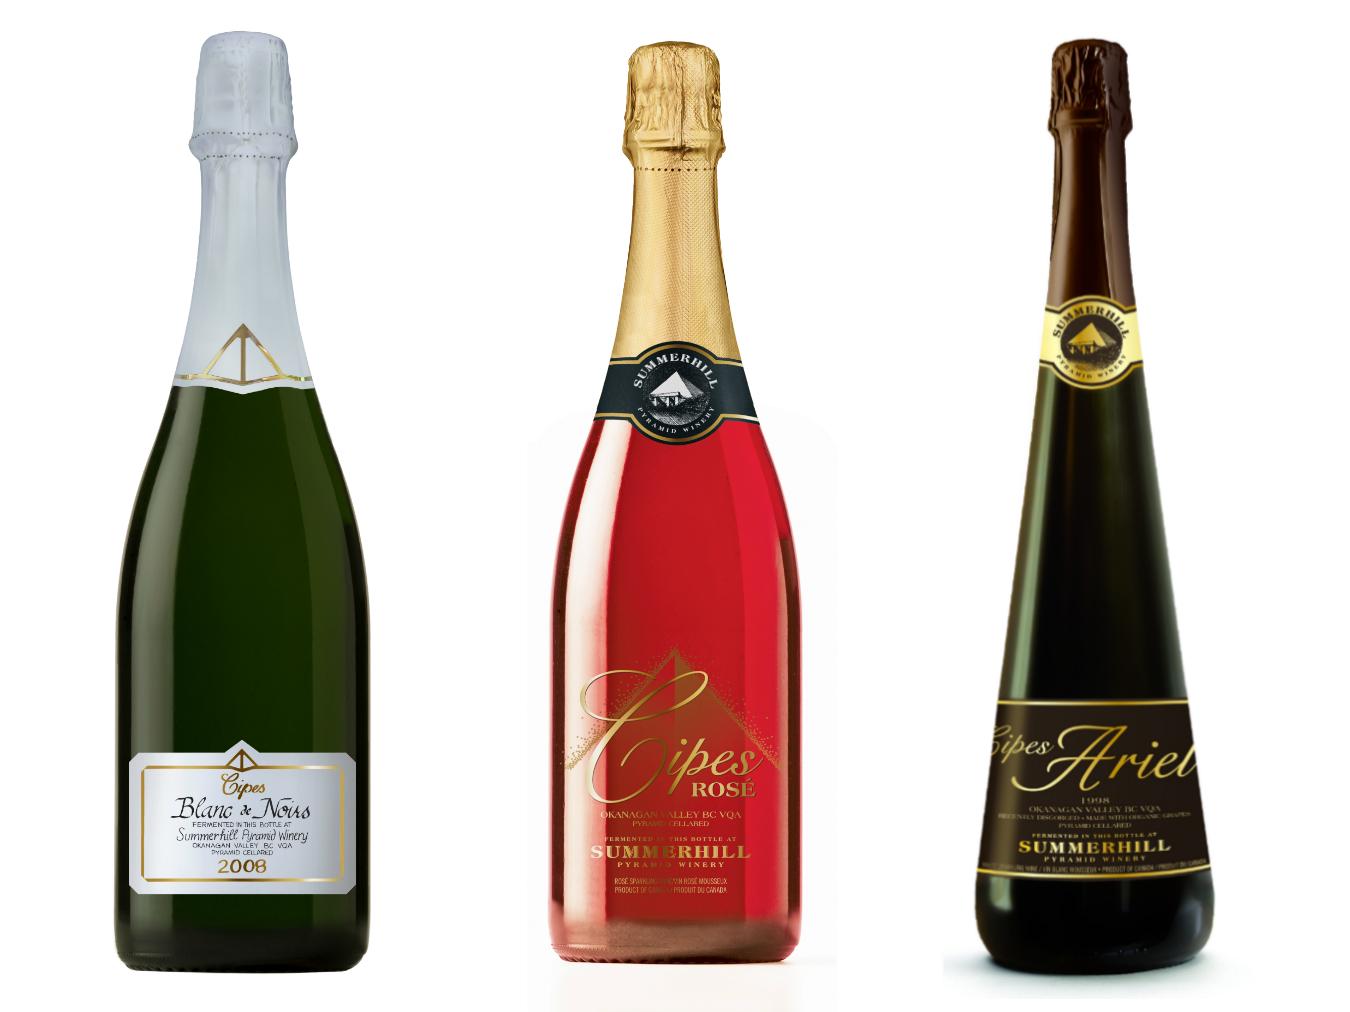 MONTE Blog: Wine Wednesday Cipes